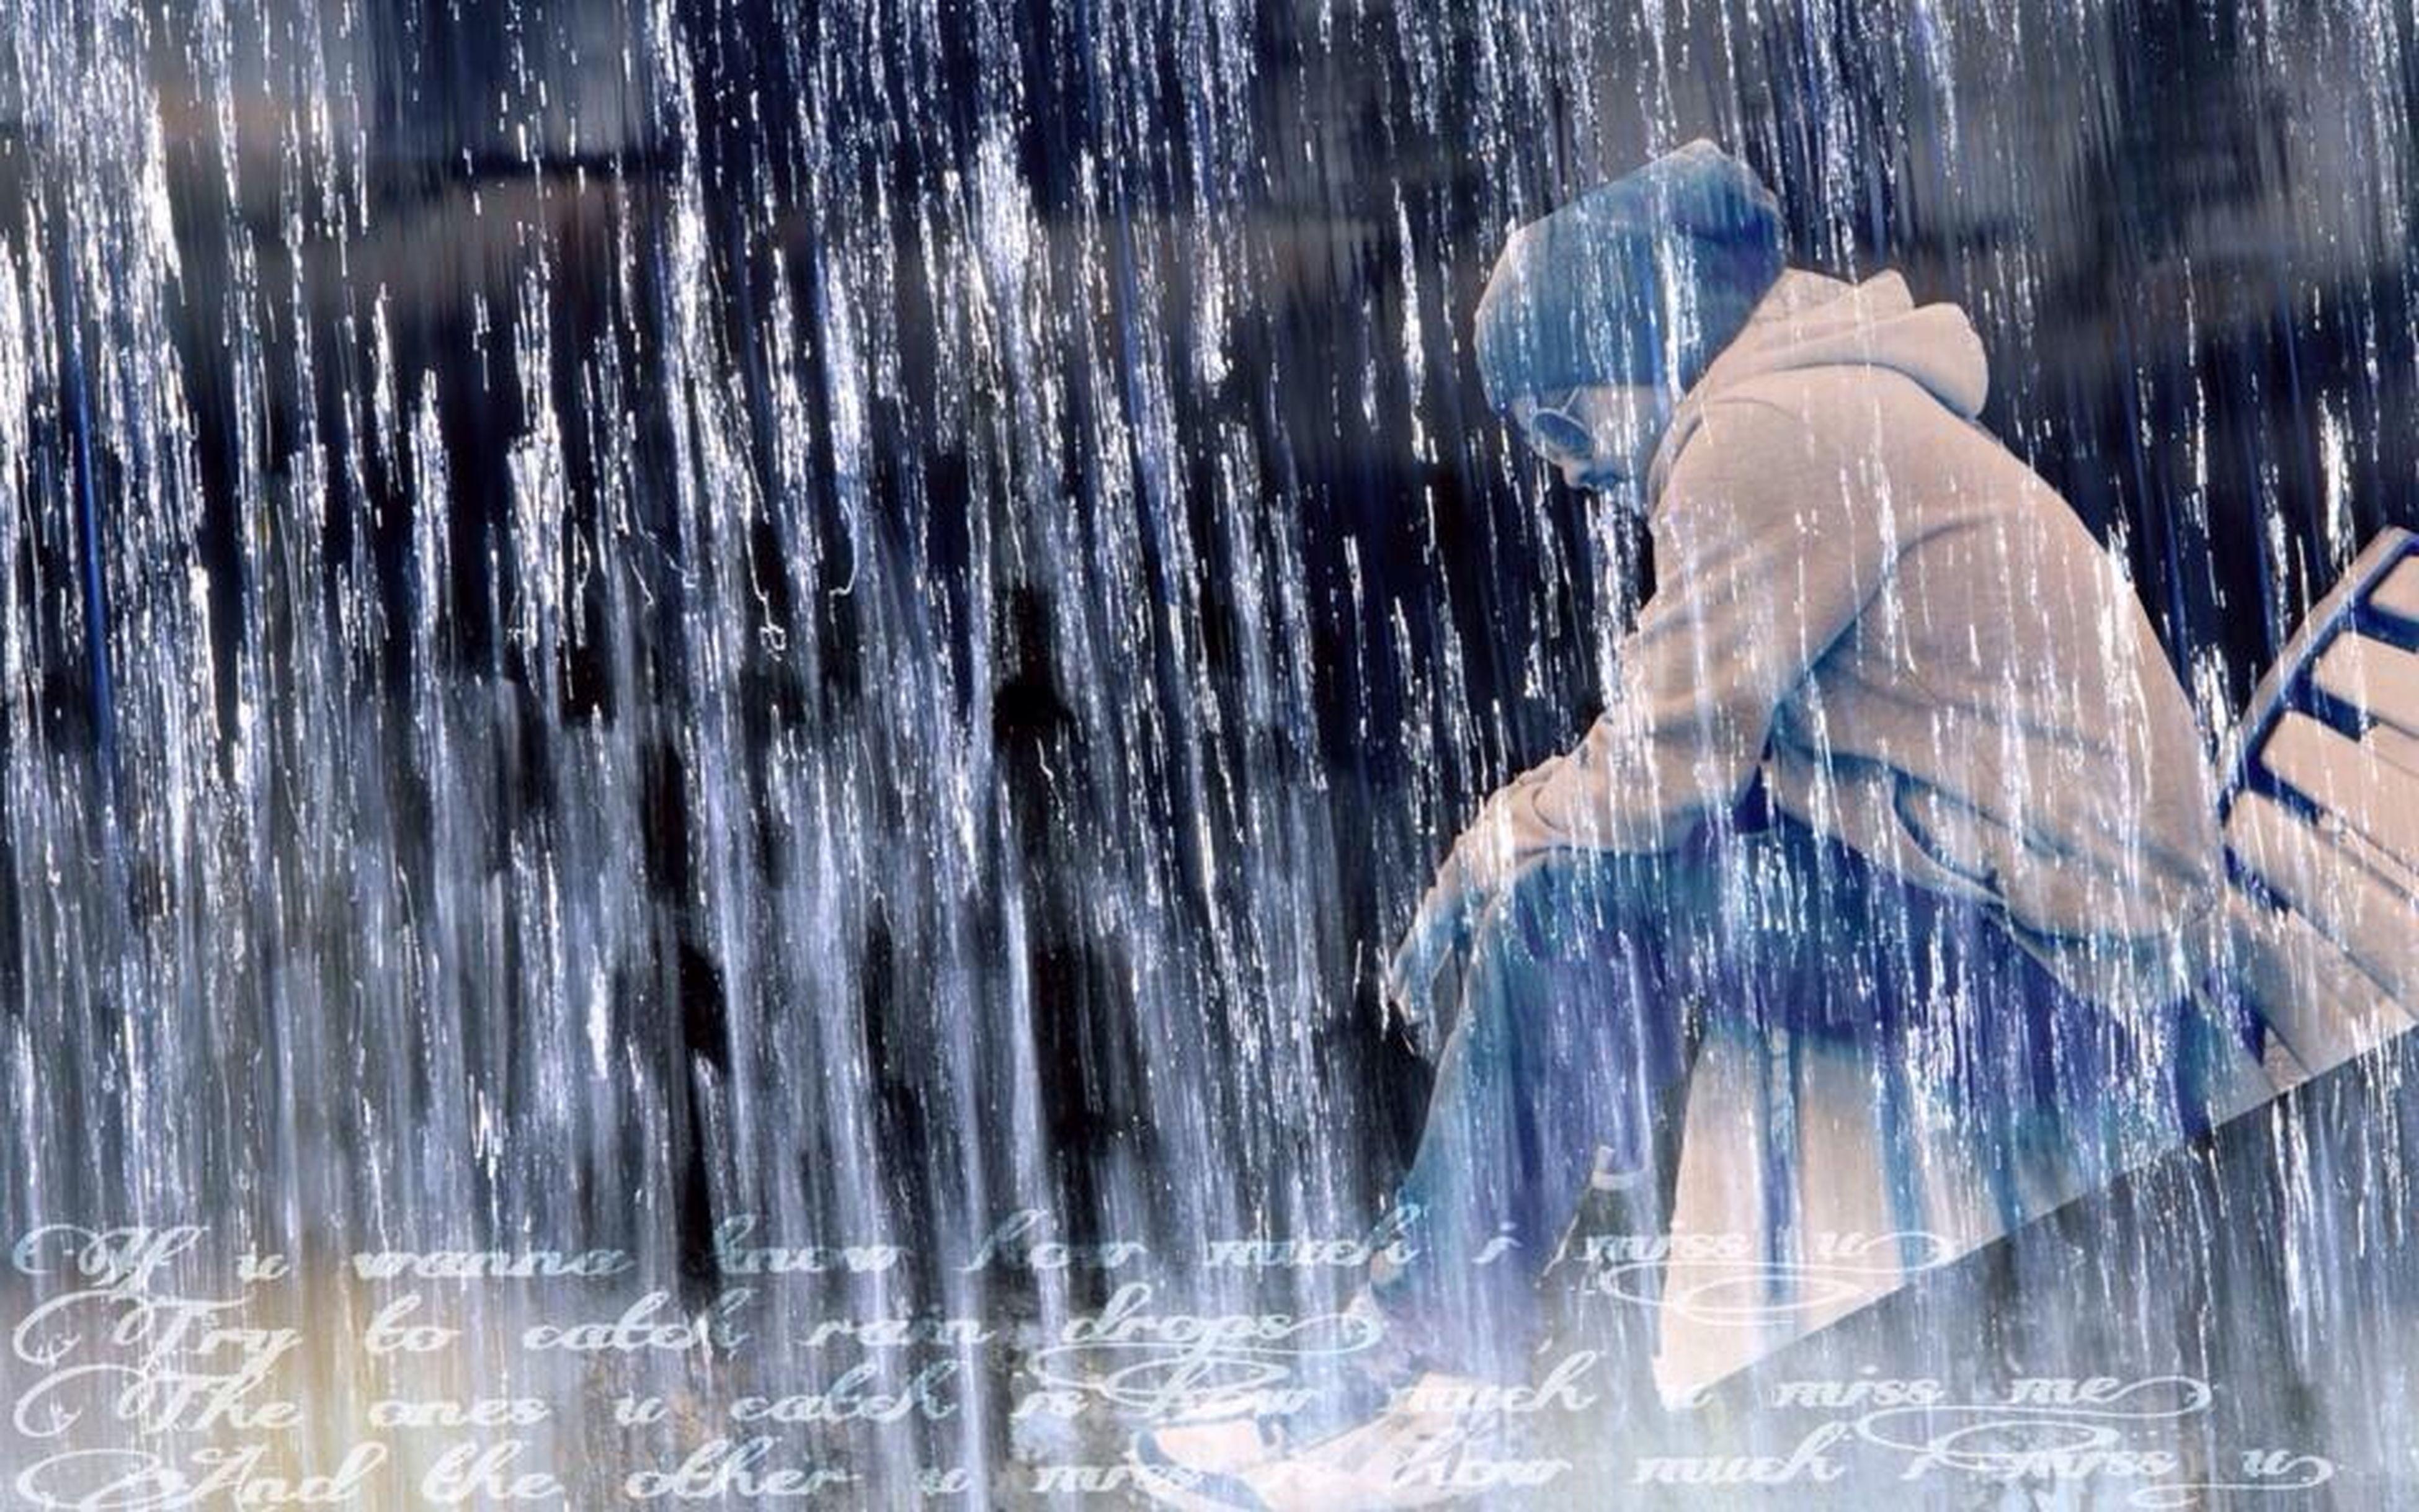 water, fountain, reflection, spraying, splashing, waterfront, motion, transparent, glass - material, tree, day, nature, long exposure, lake, outdoors, waterfall, wet, spray, pattern